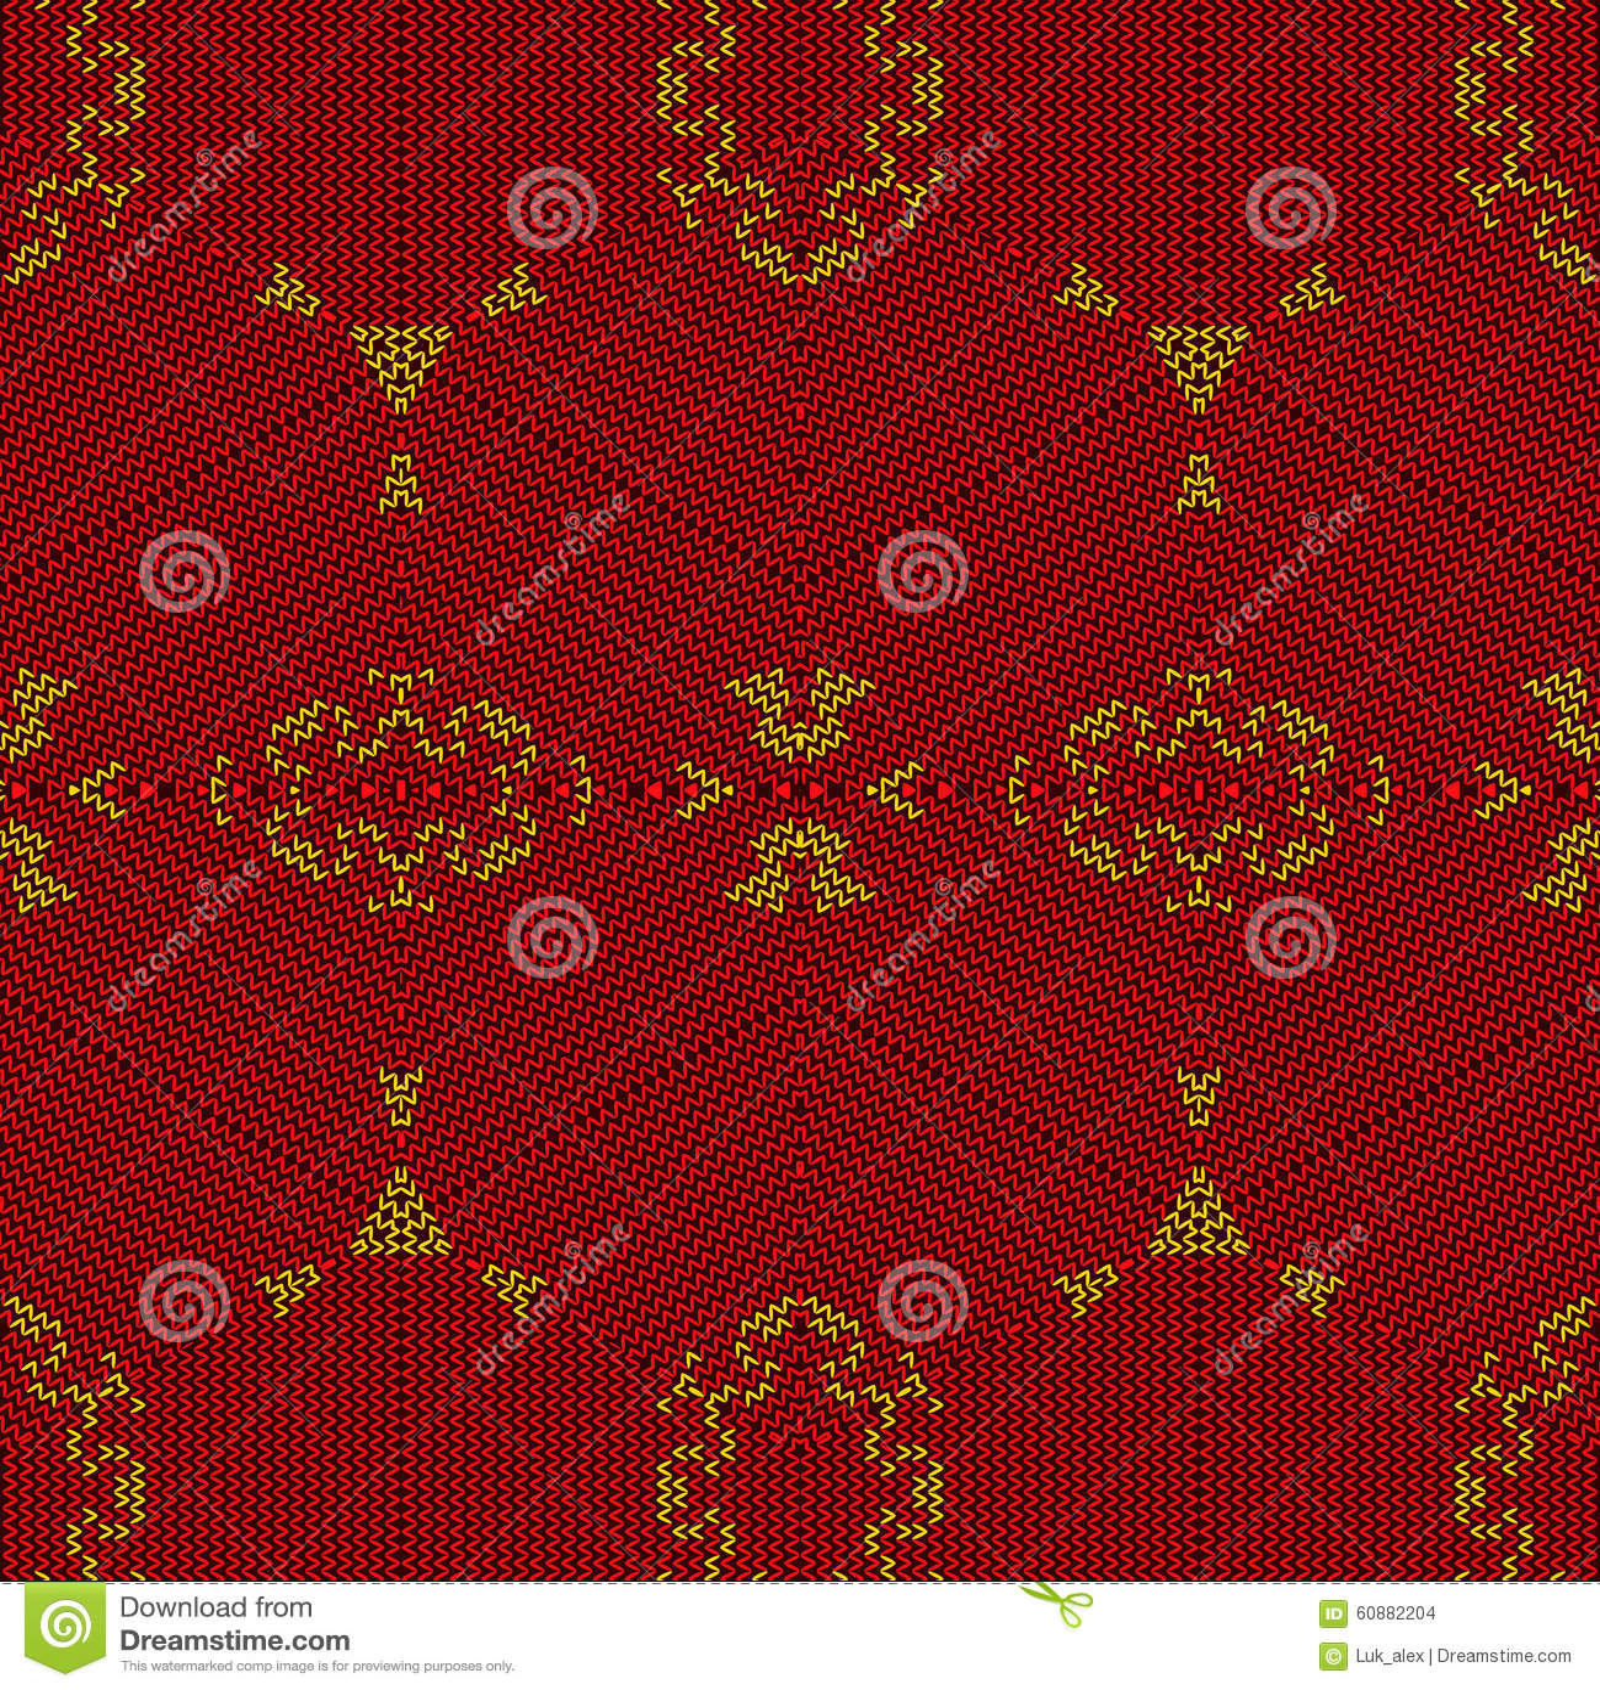 Knitting Pattern Generator Graphics : Knitting Pattern Stock Vector - Image: 60882204